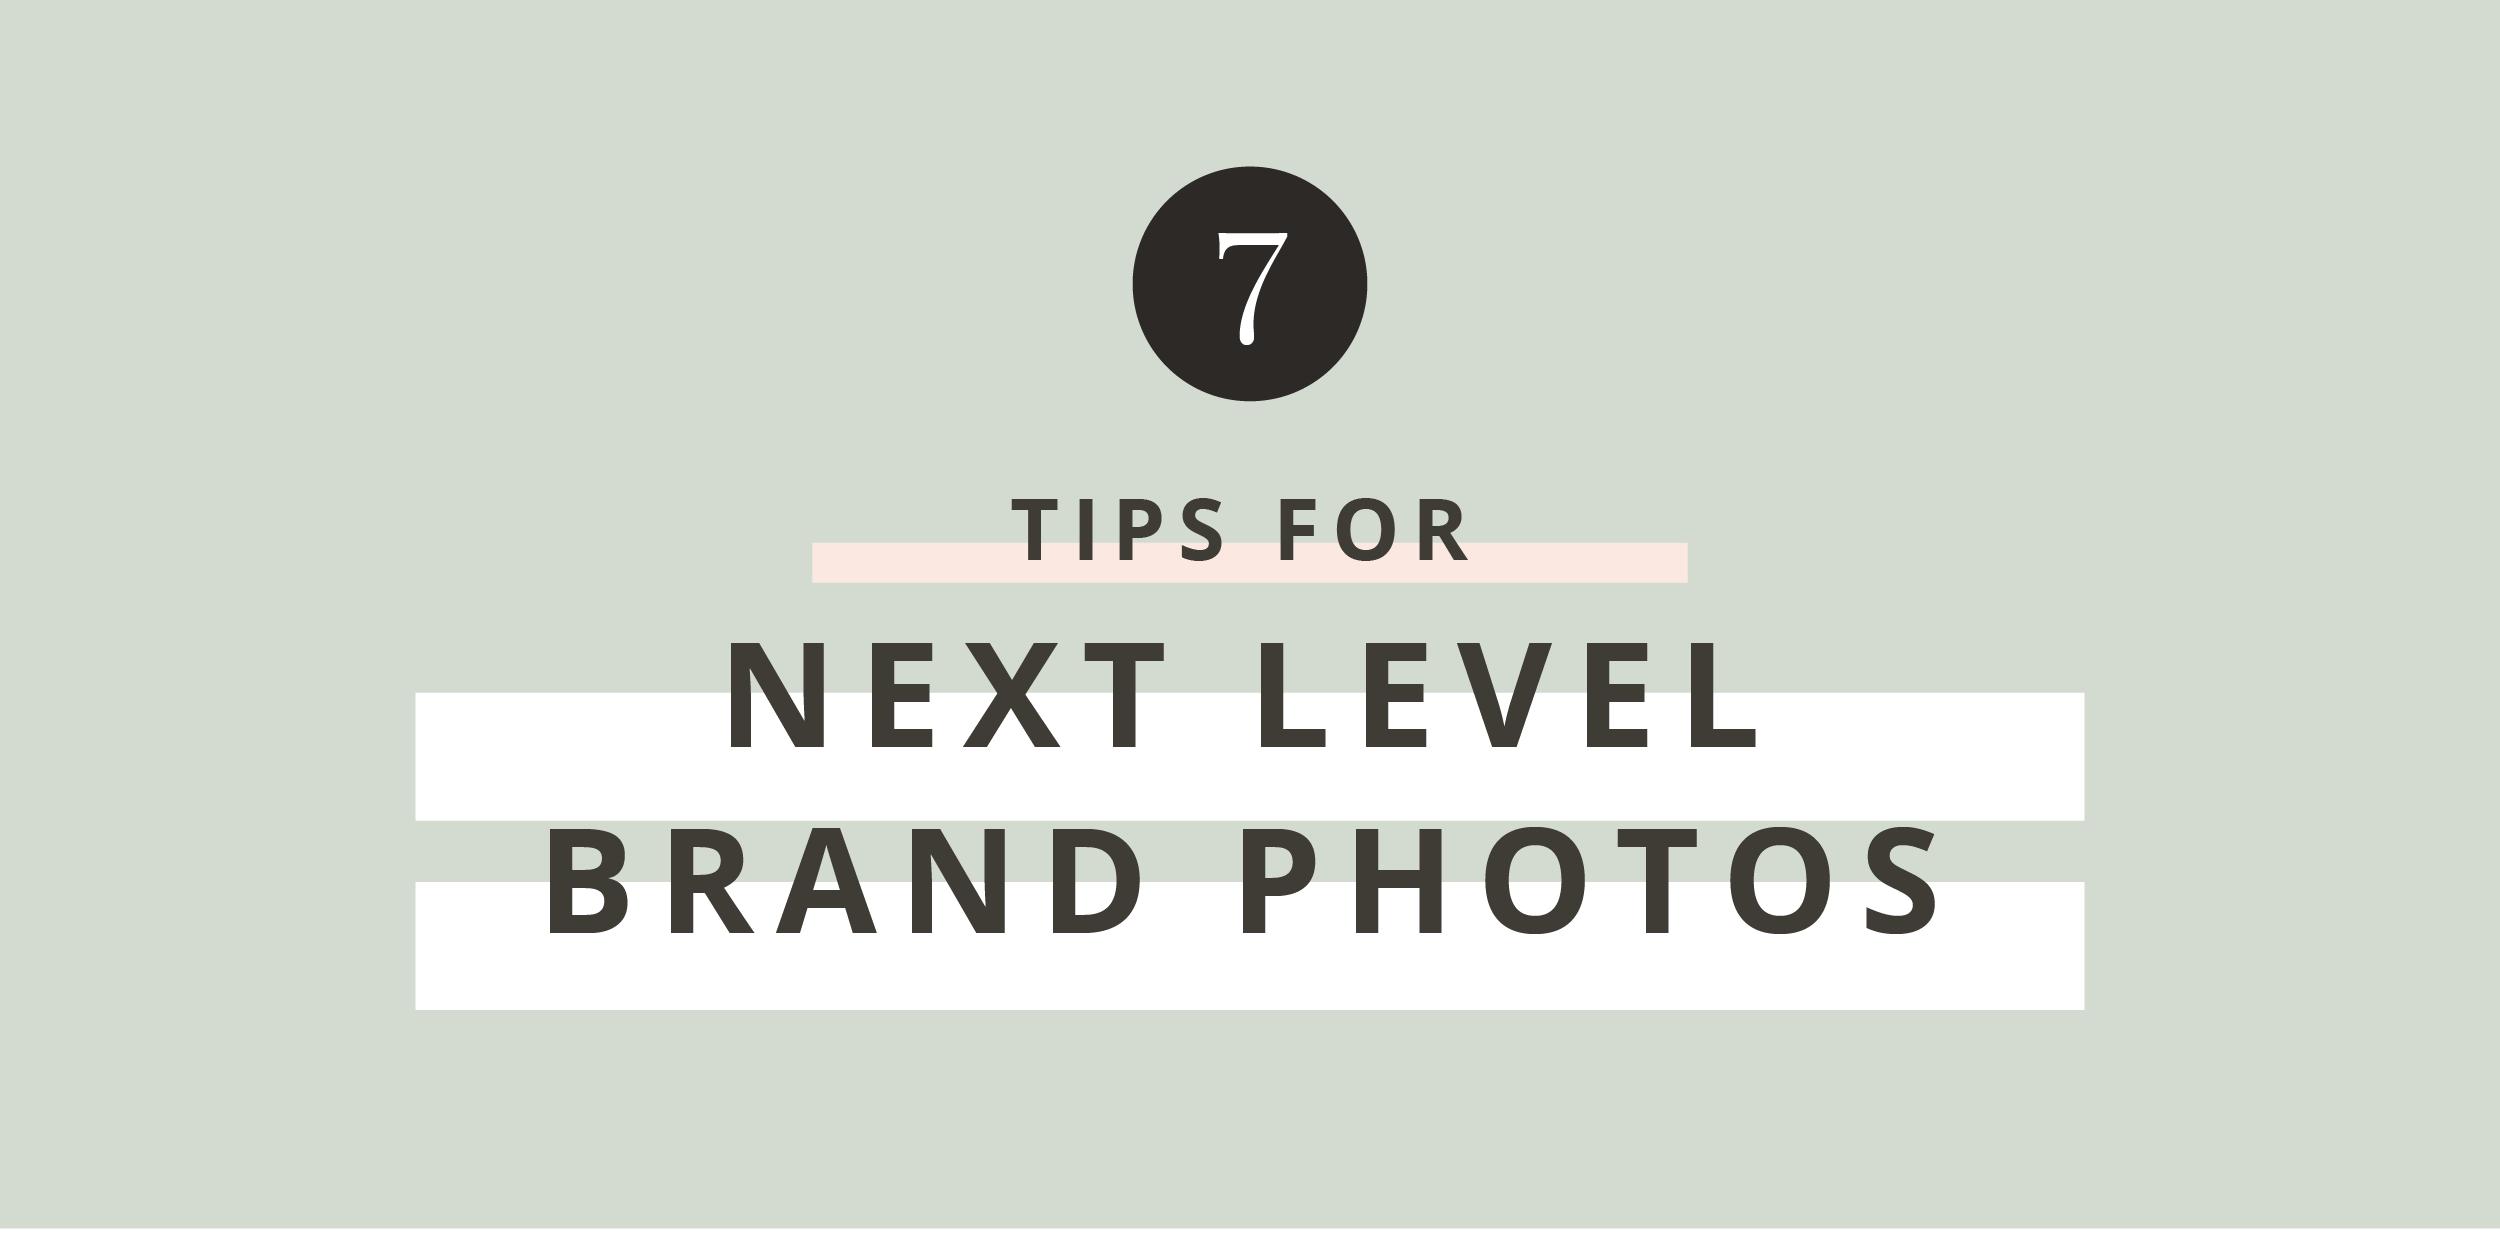 7 tips for next level brand photos